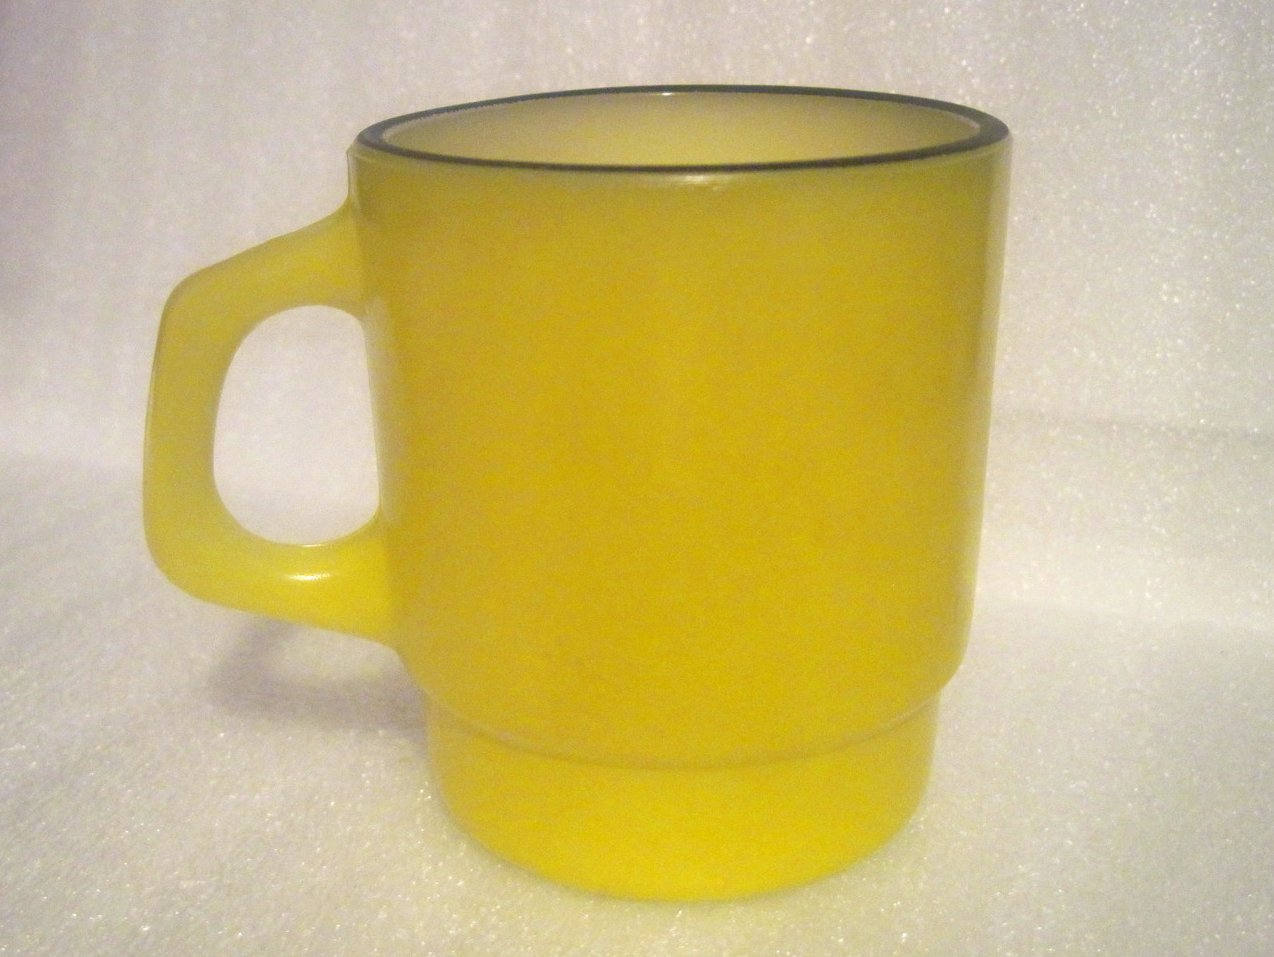 Coffee Mug Fire King Yellow Black Rim Stackable Rare Handle Vintage